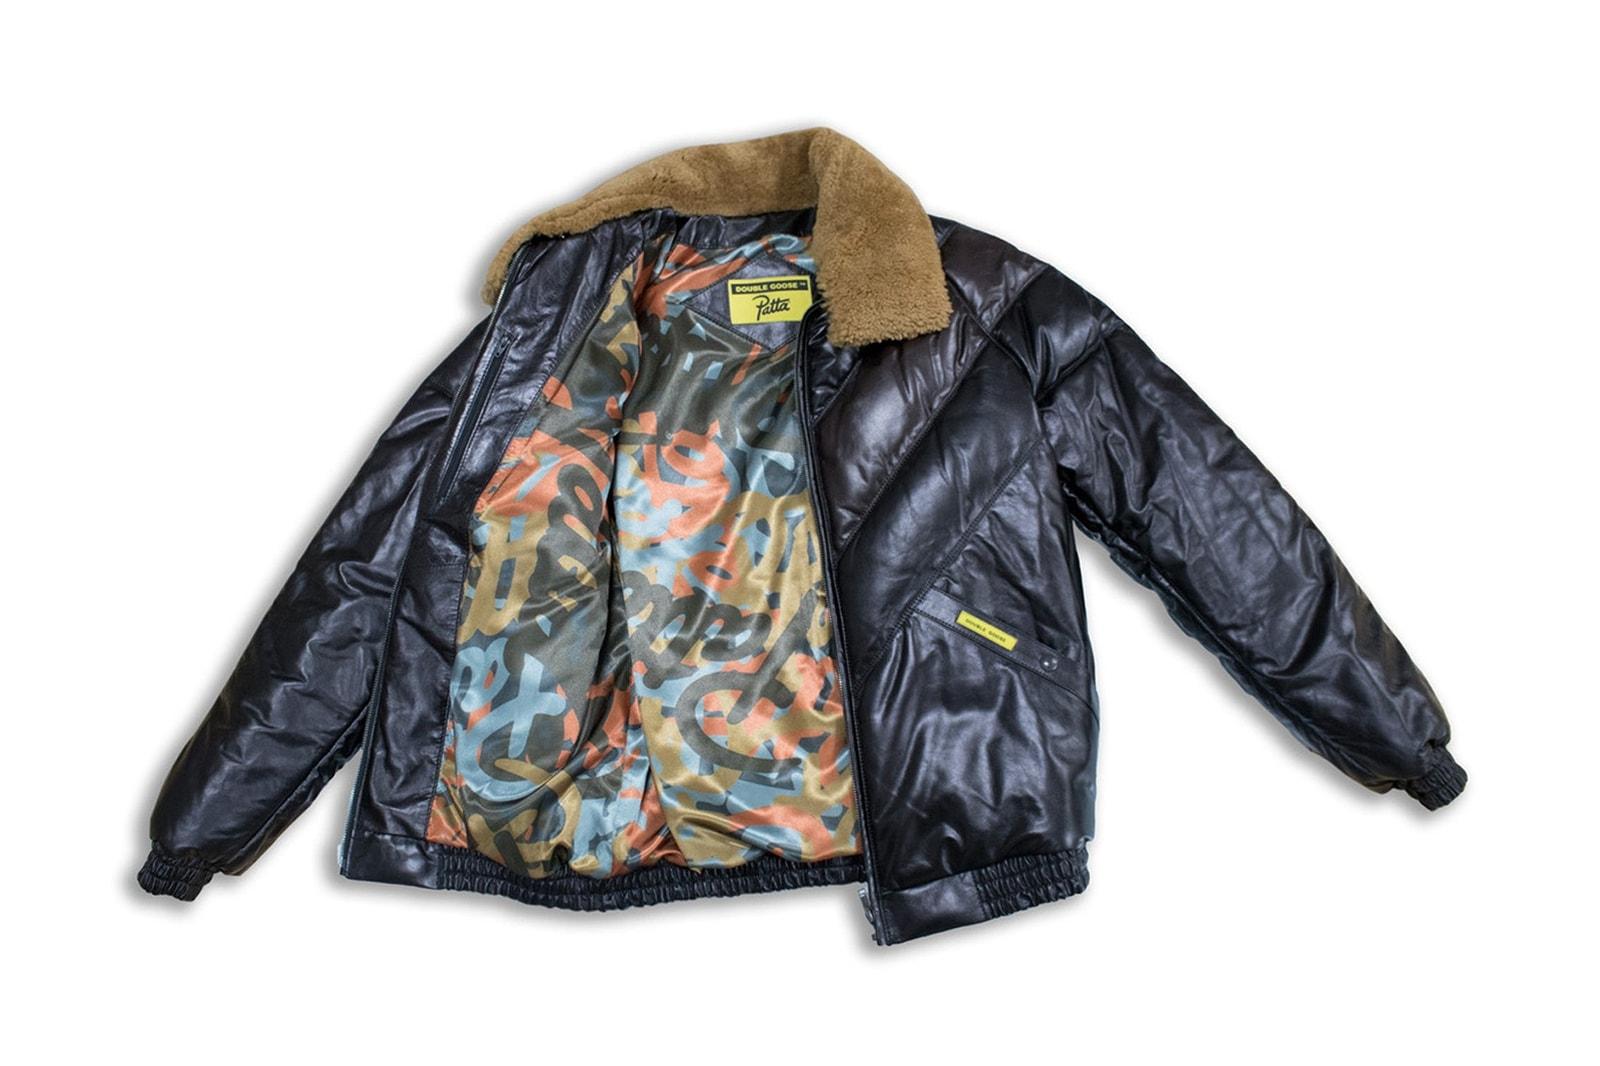 Carhartt WIP Patta PACCBET Double Goose Ullac UNITED ARROWS & SONS adidas Originals NMD_R2 NMD_CS1 Yardsale Aries STORY mfg. Weekday Champion Sneakersnstuff Reebok Classic Leather